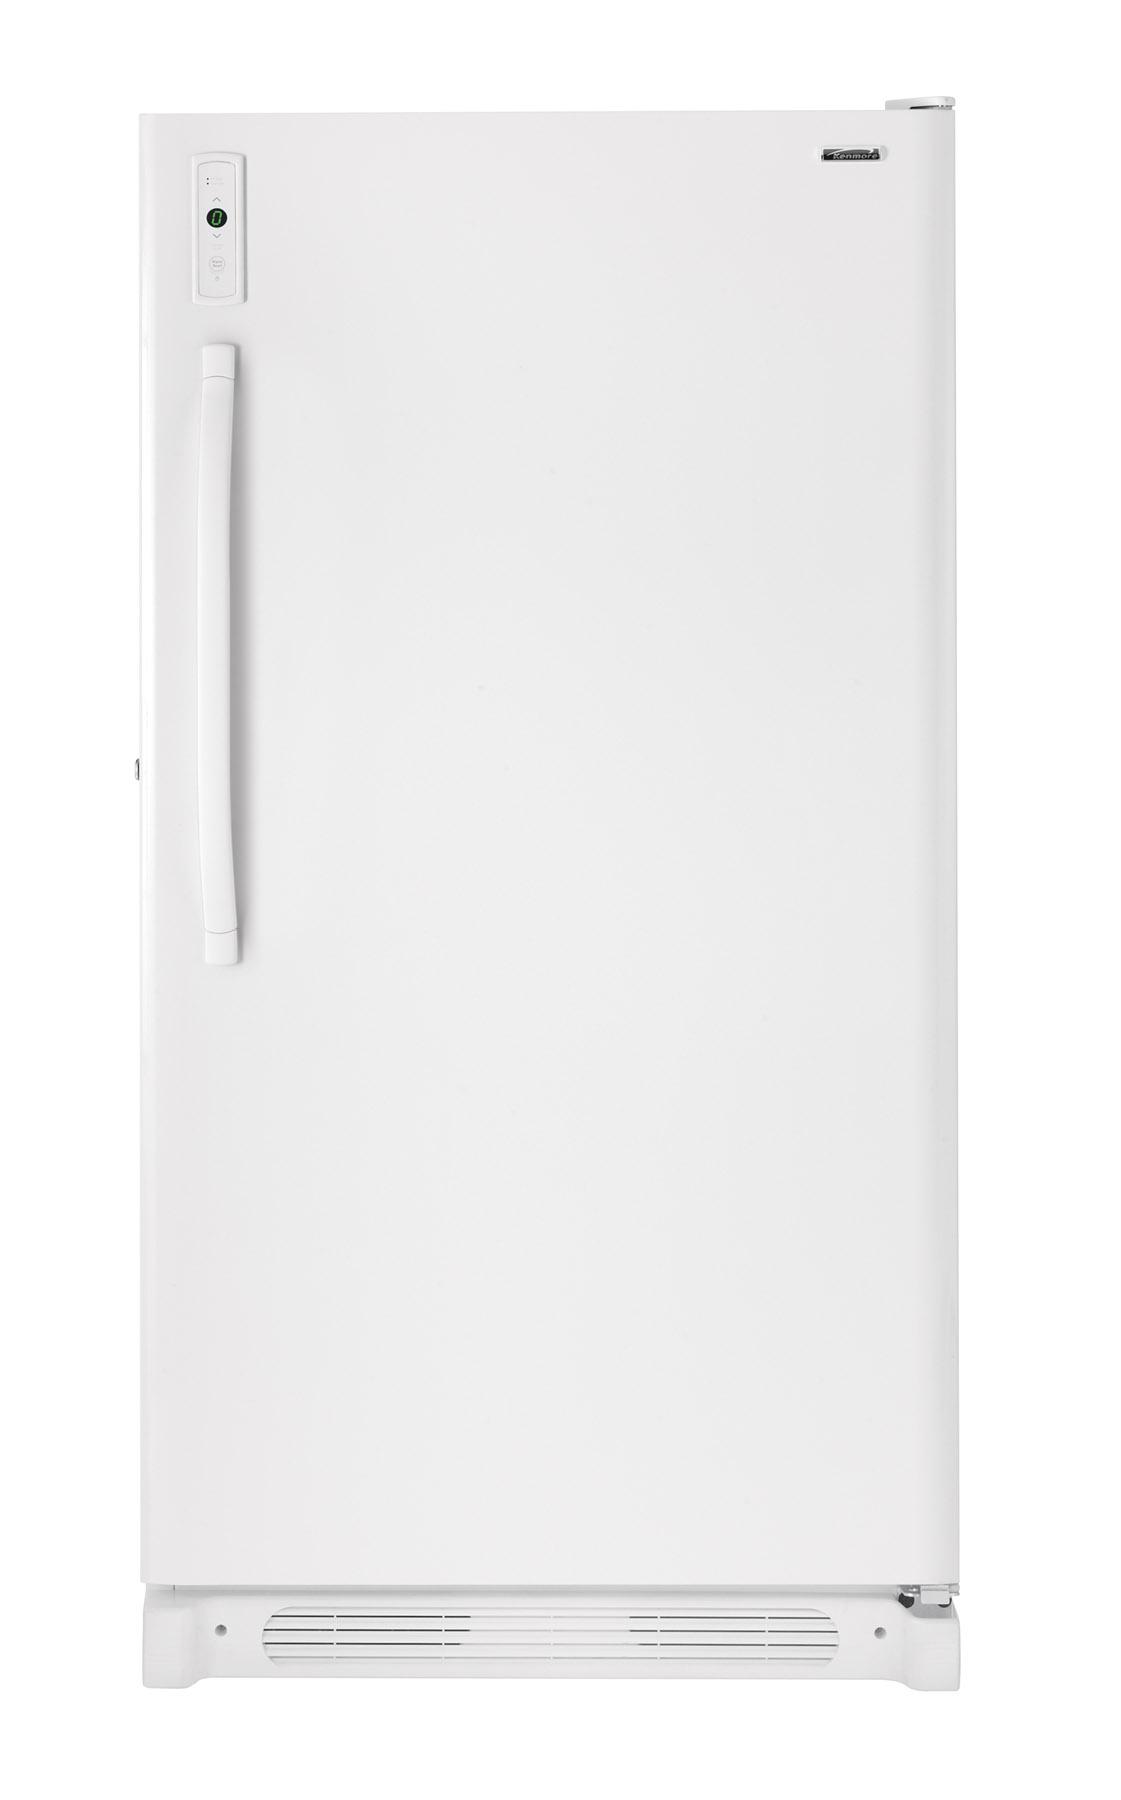 Kenmore Freezer Model 253.28782801 Parts